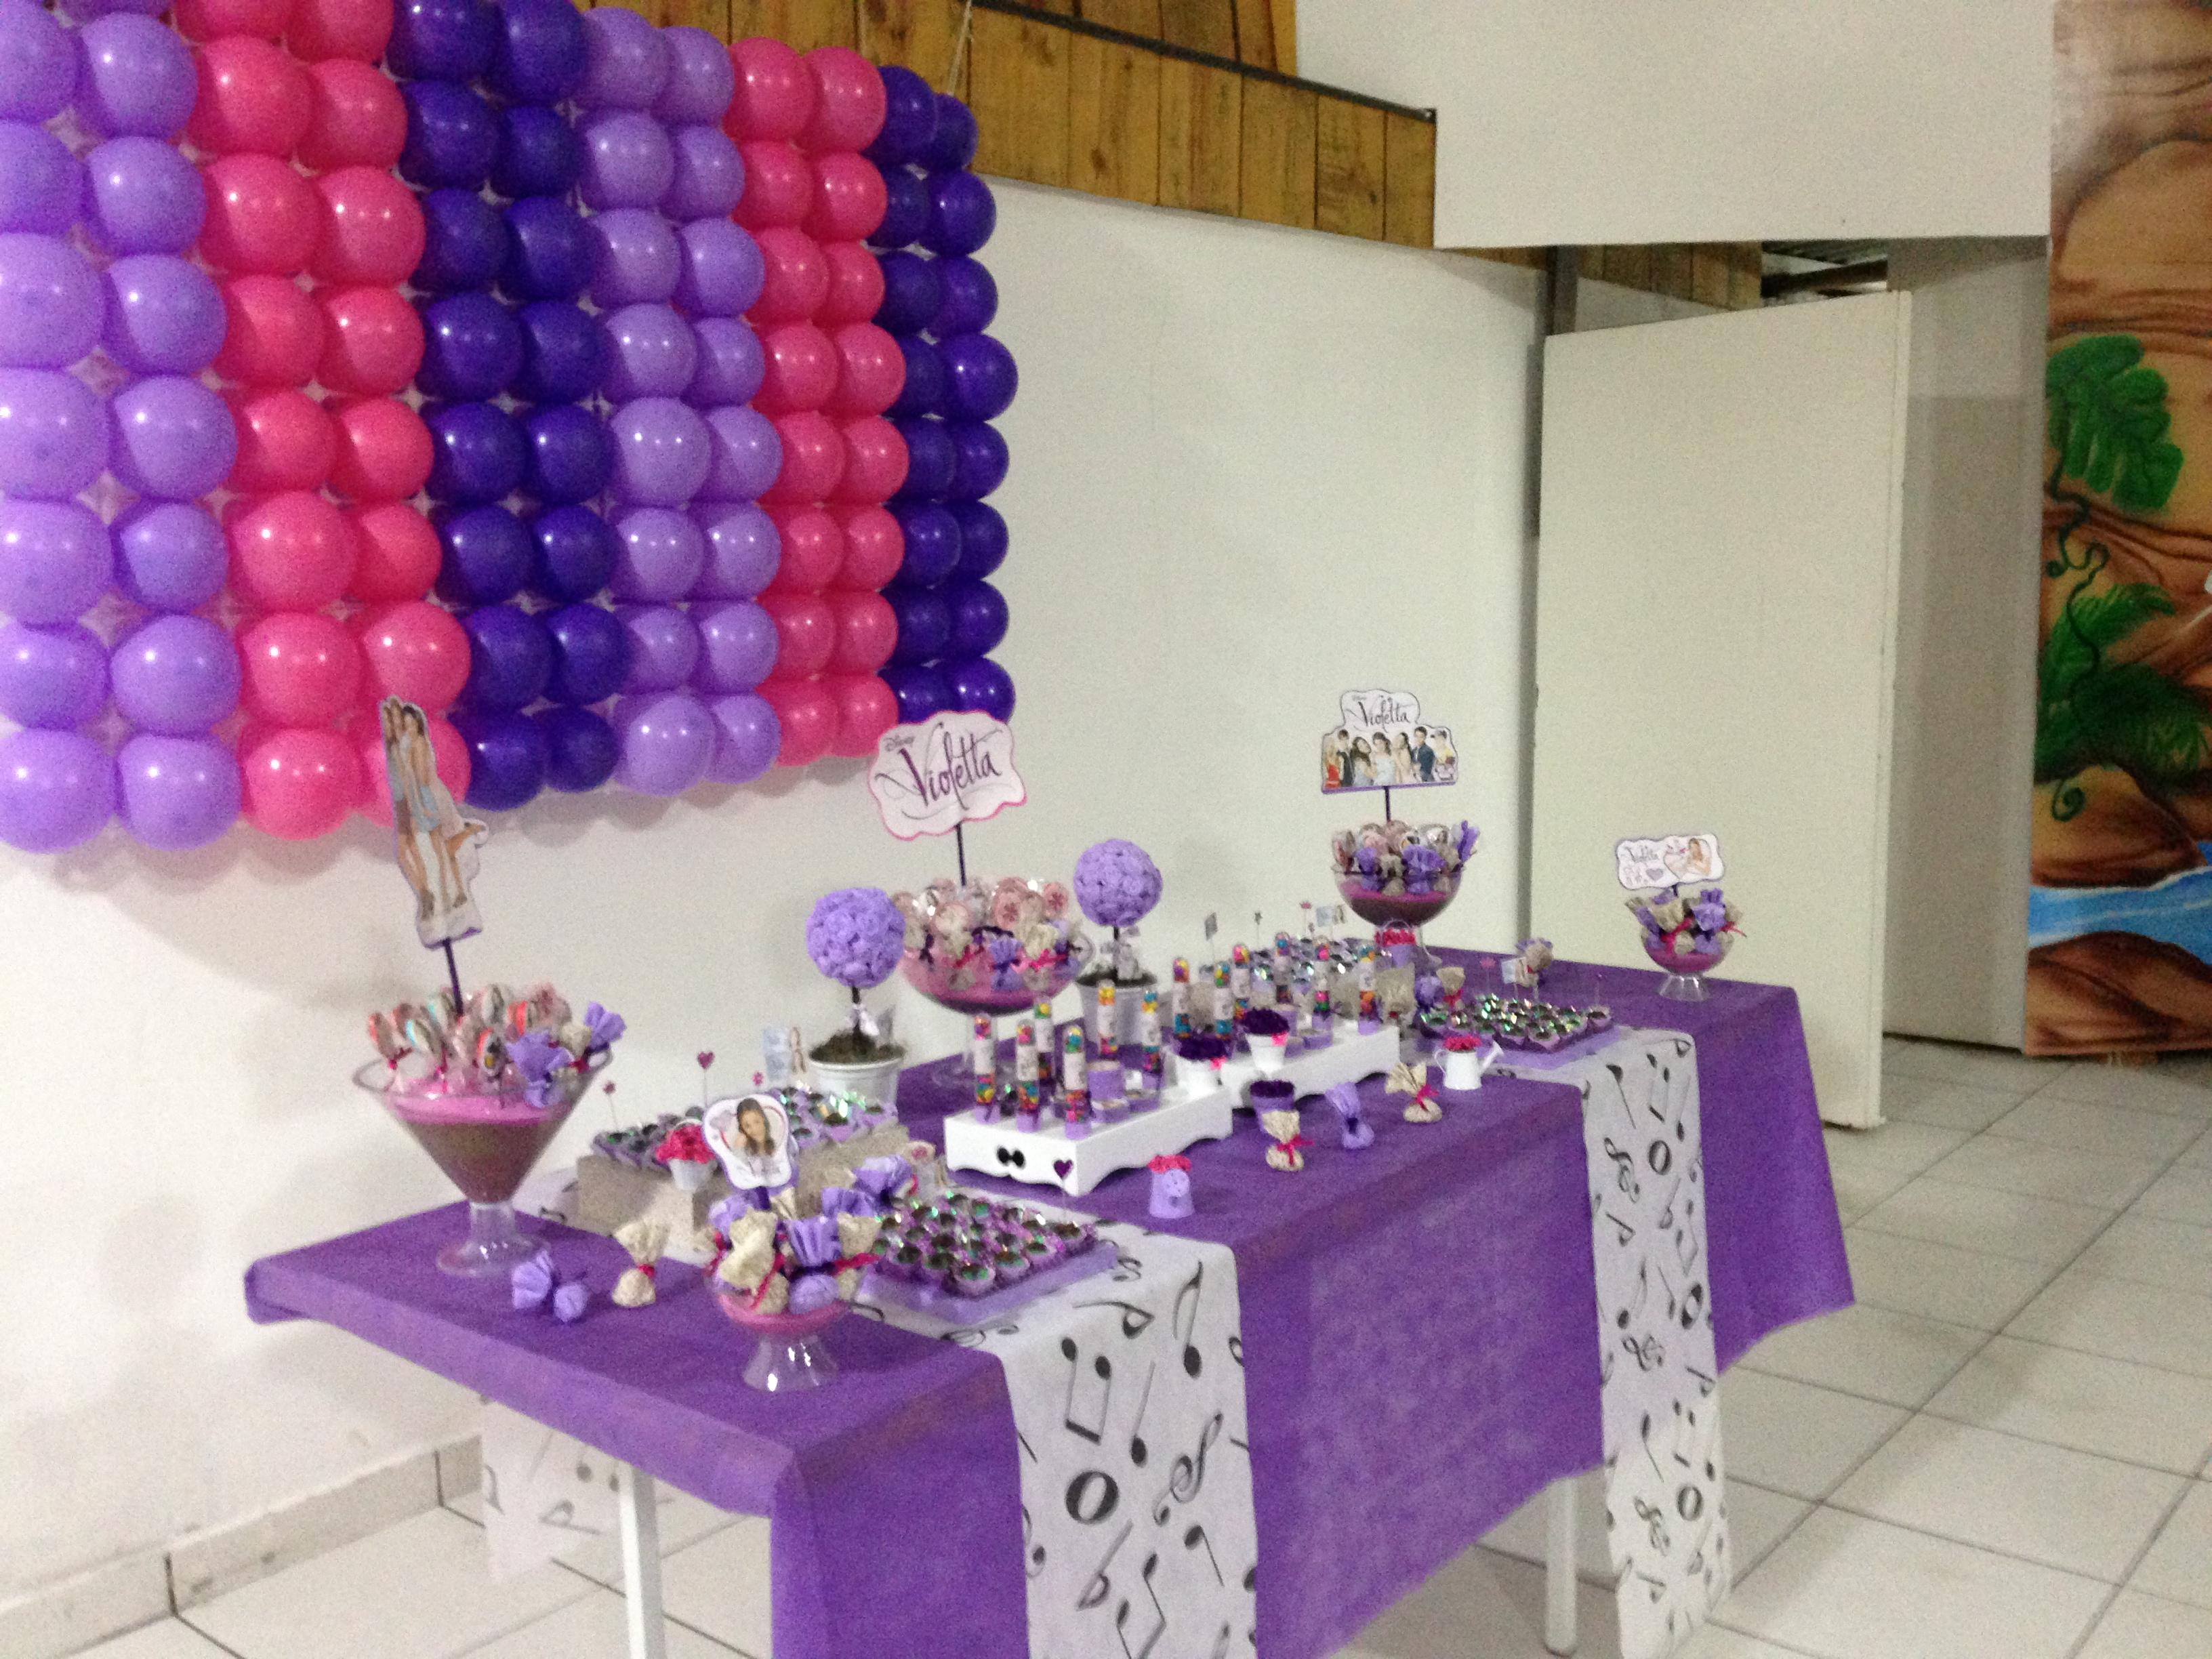 decoracao festa violeta:festa violetta disney festa violetta disney festa violetta disney